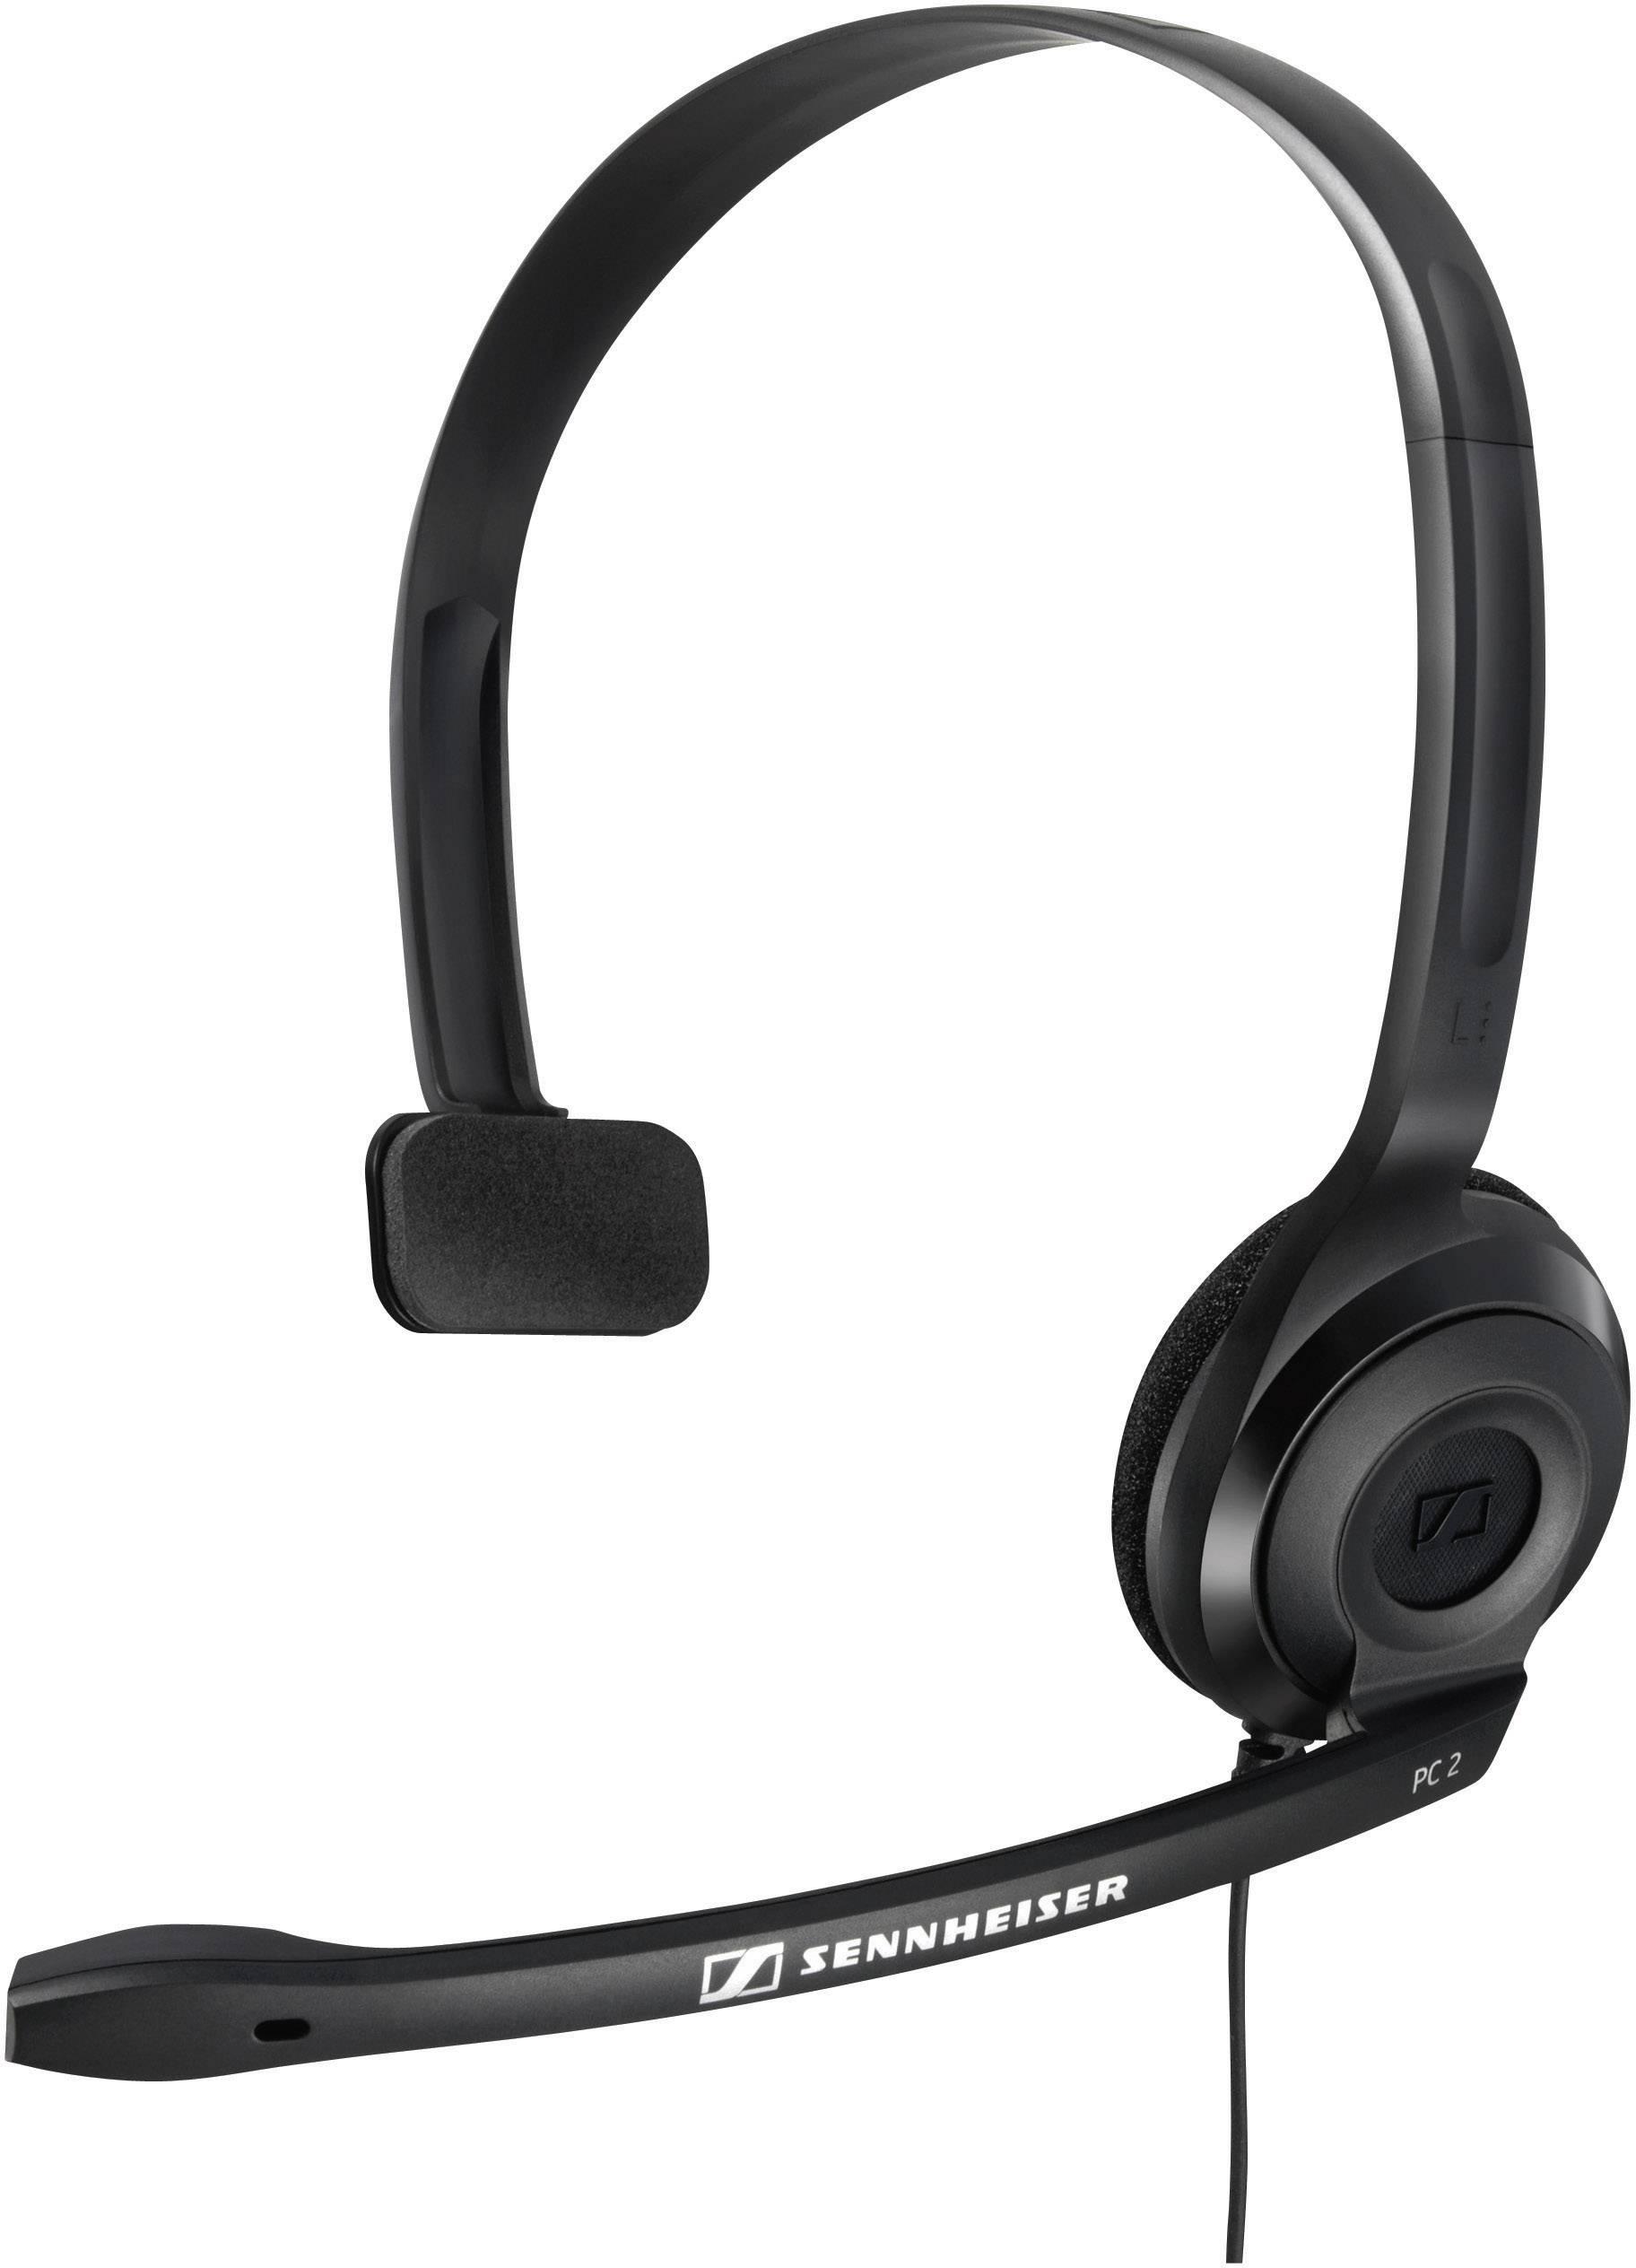 PC-headset On-ear Sennheiser PC 2 Chat 3 51d0d4ddb7142